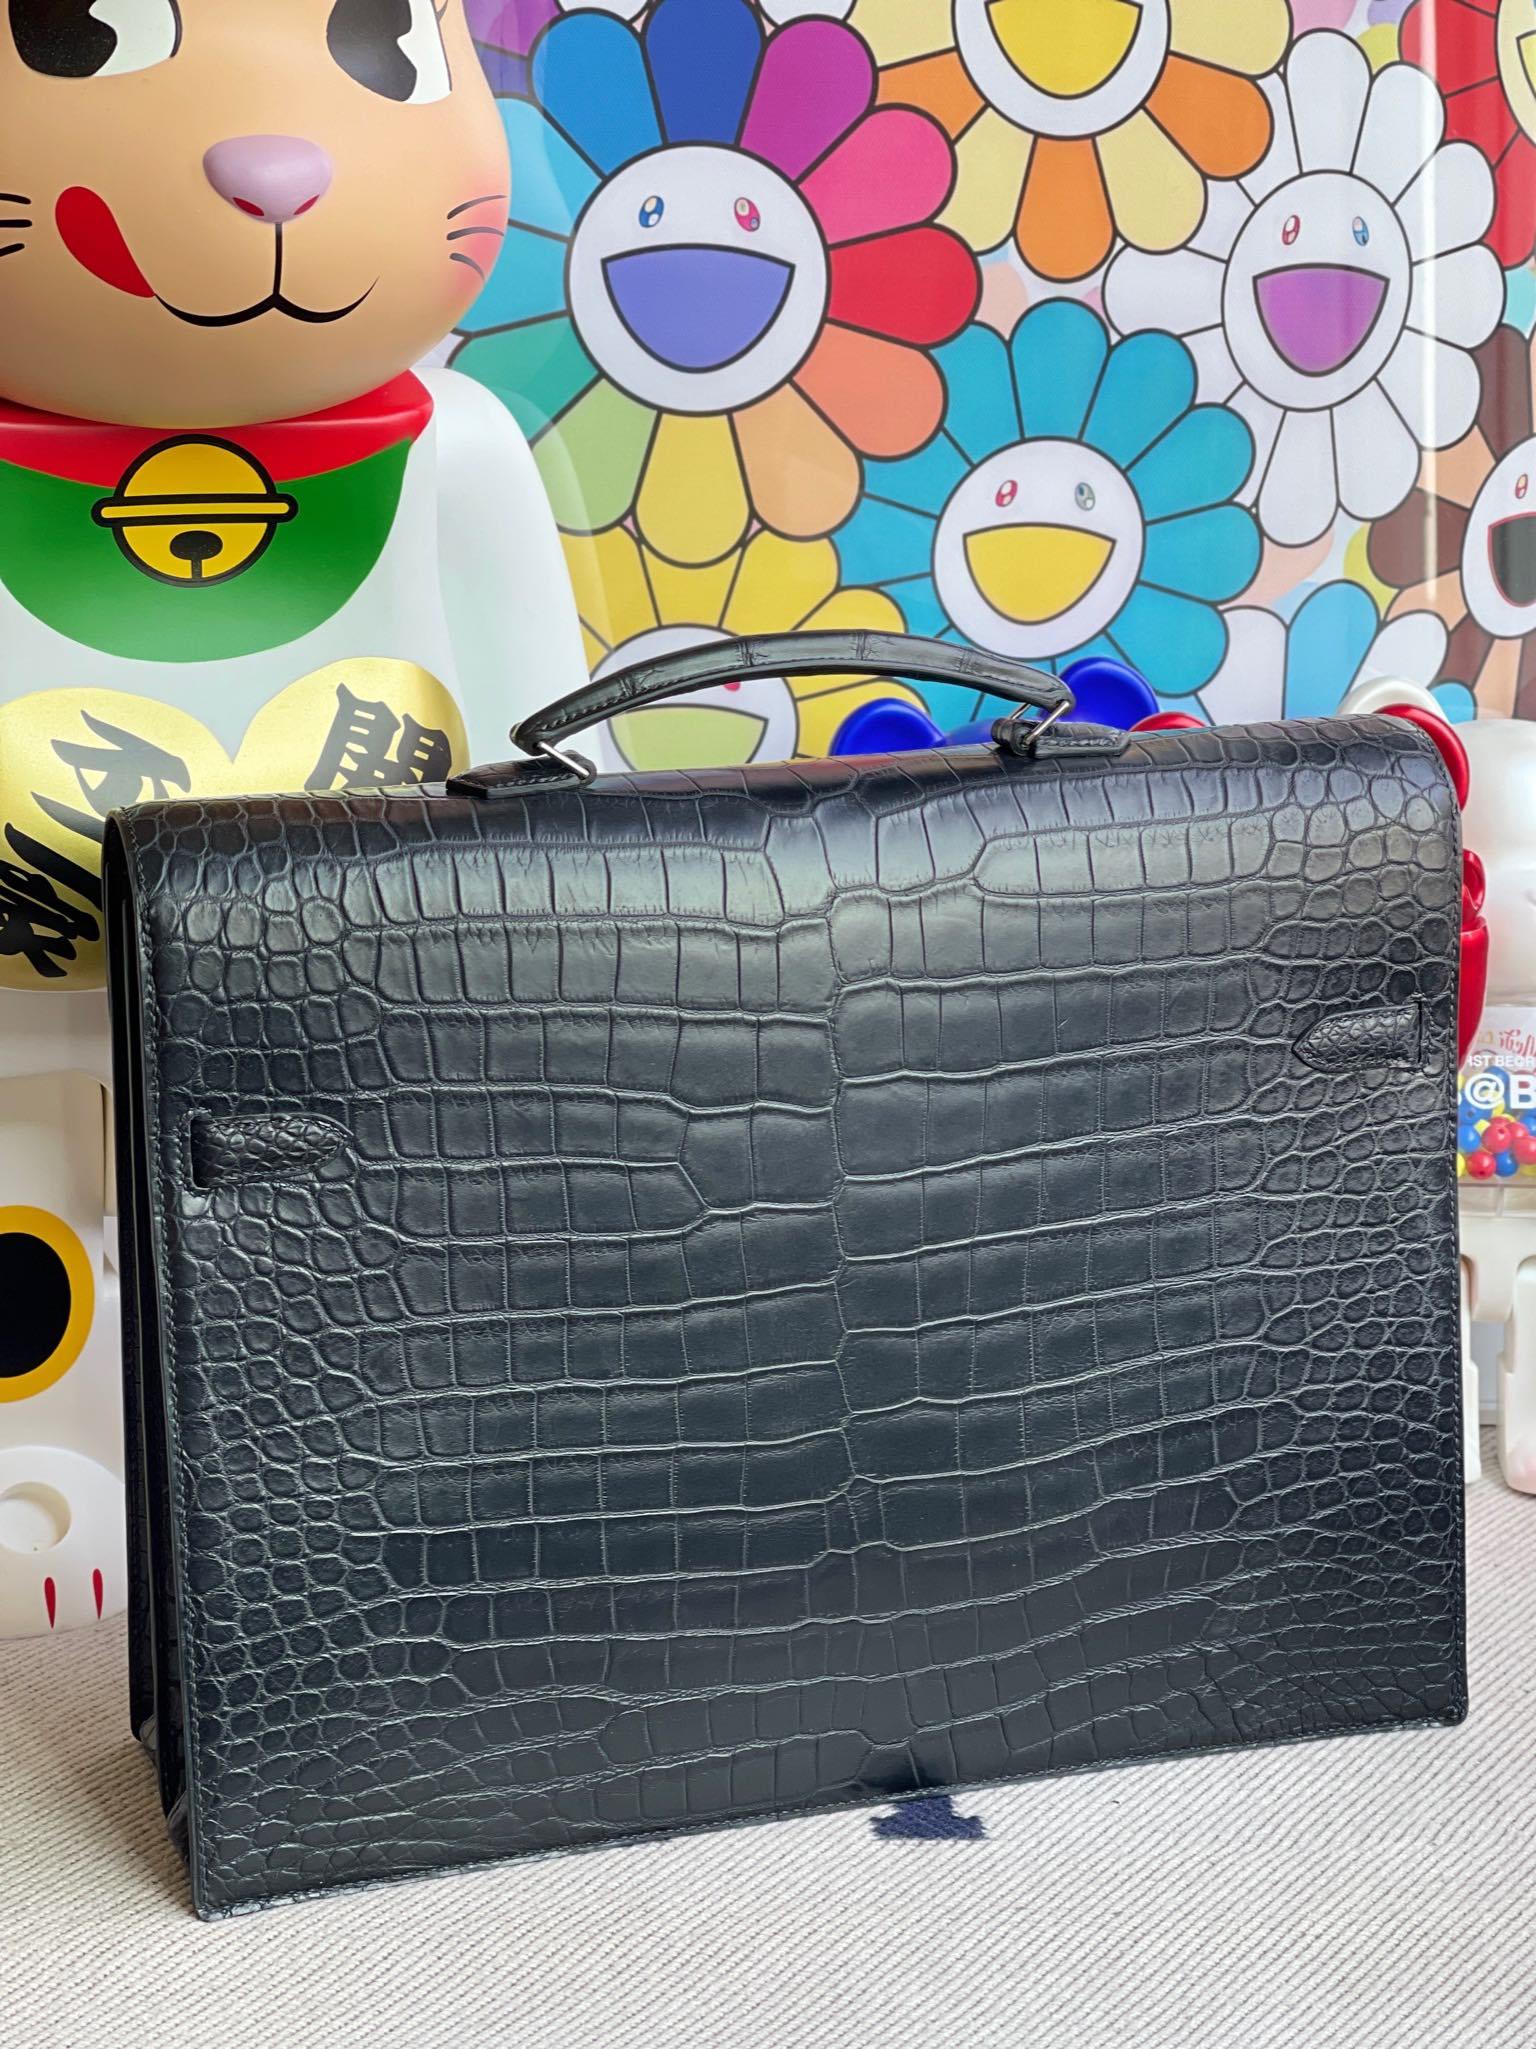 Hermès(爱马仕)Kelly depeche porosus matt 雾面鳄鱼 ck89 黑色 Noir 银扣 38cm 顶级手缝